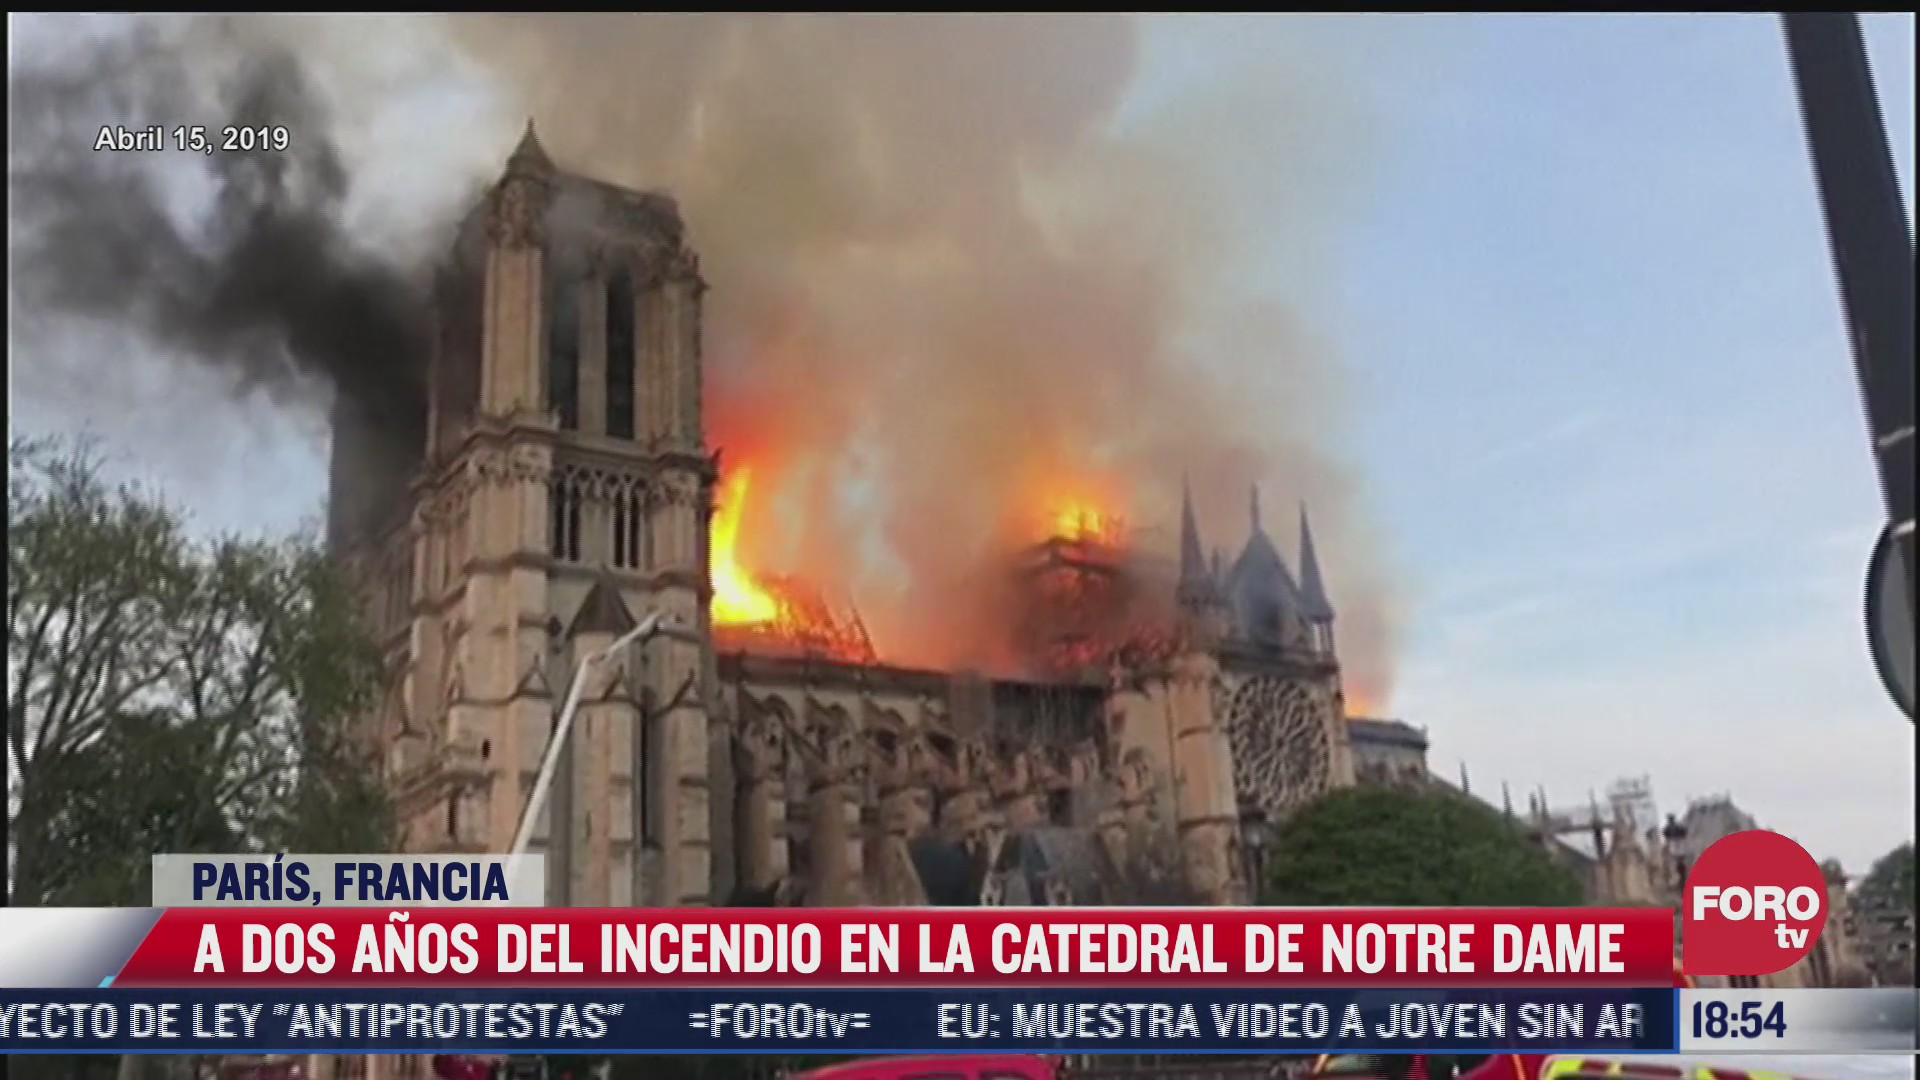 incendio en catedral de notre dame cumple dos anos